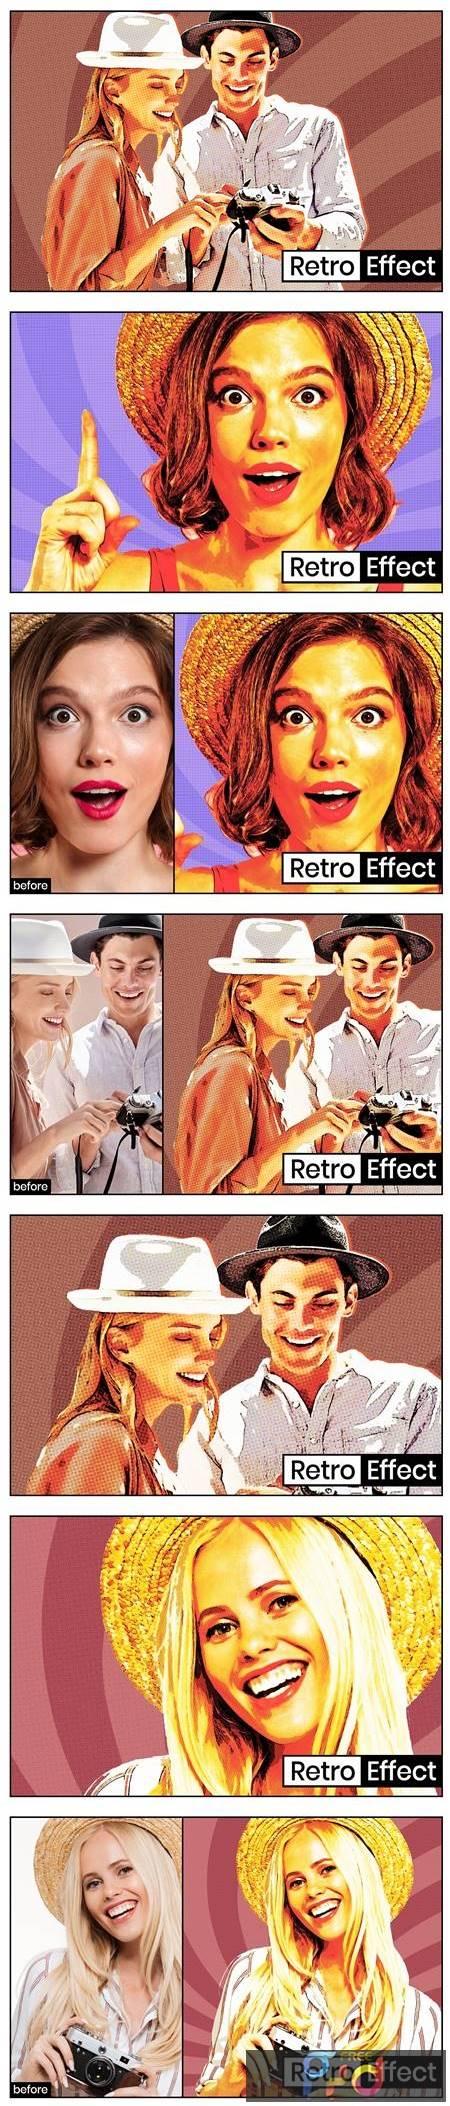 Retro Poster Effect 5028505 1